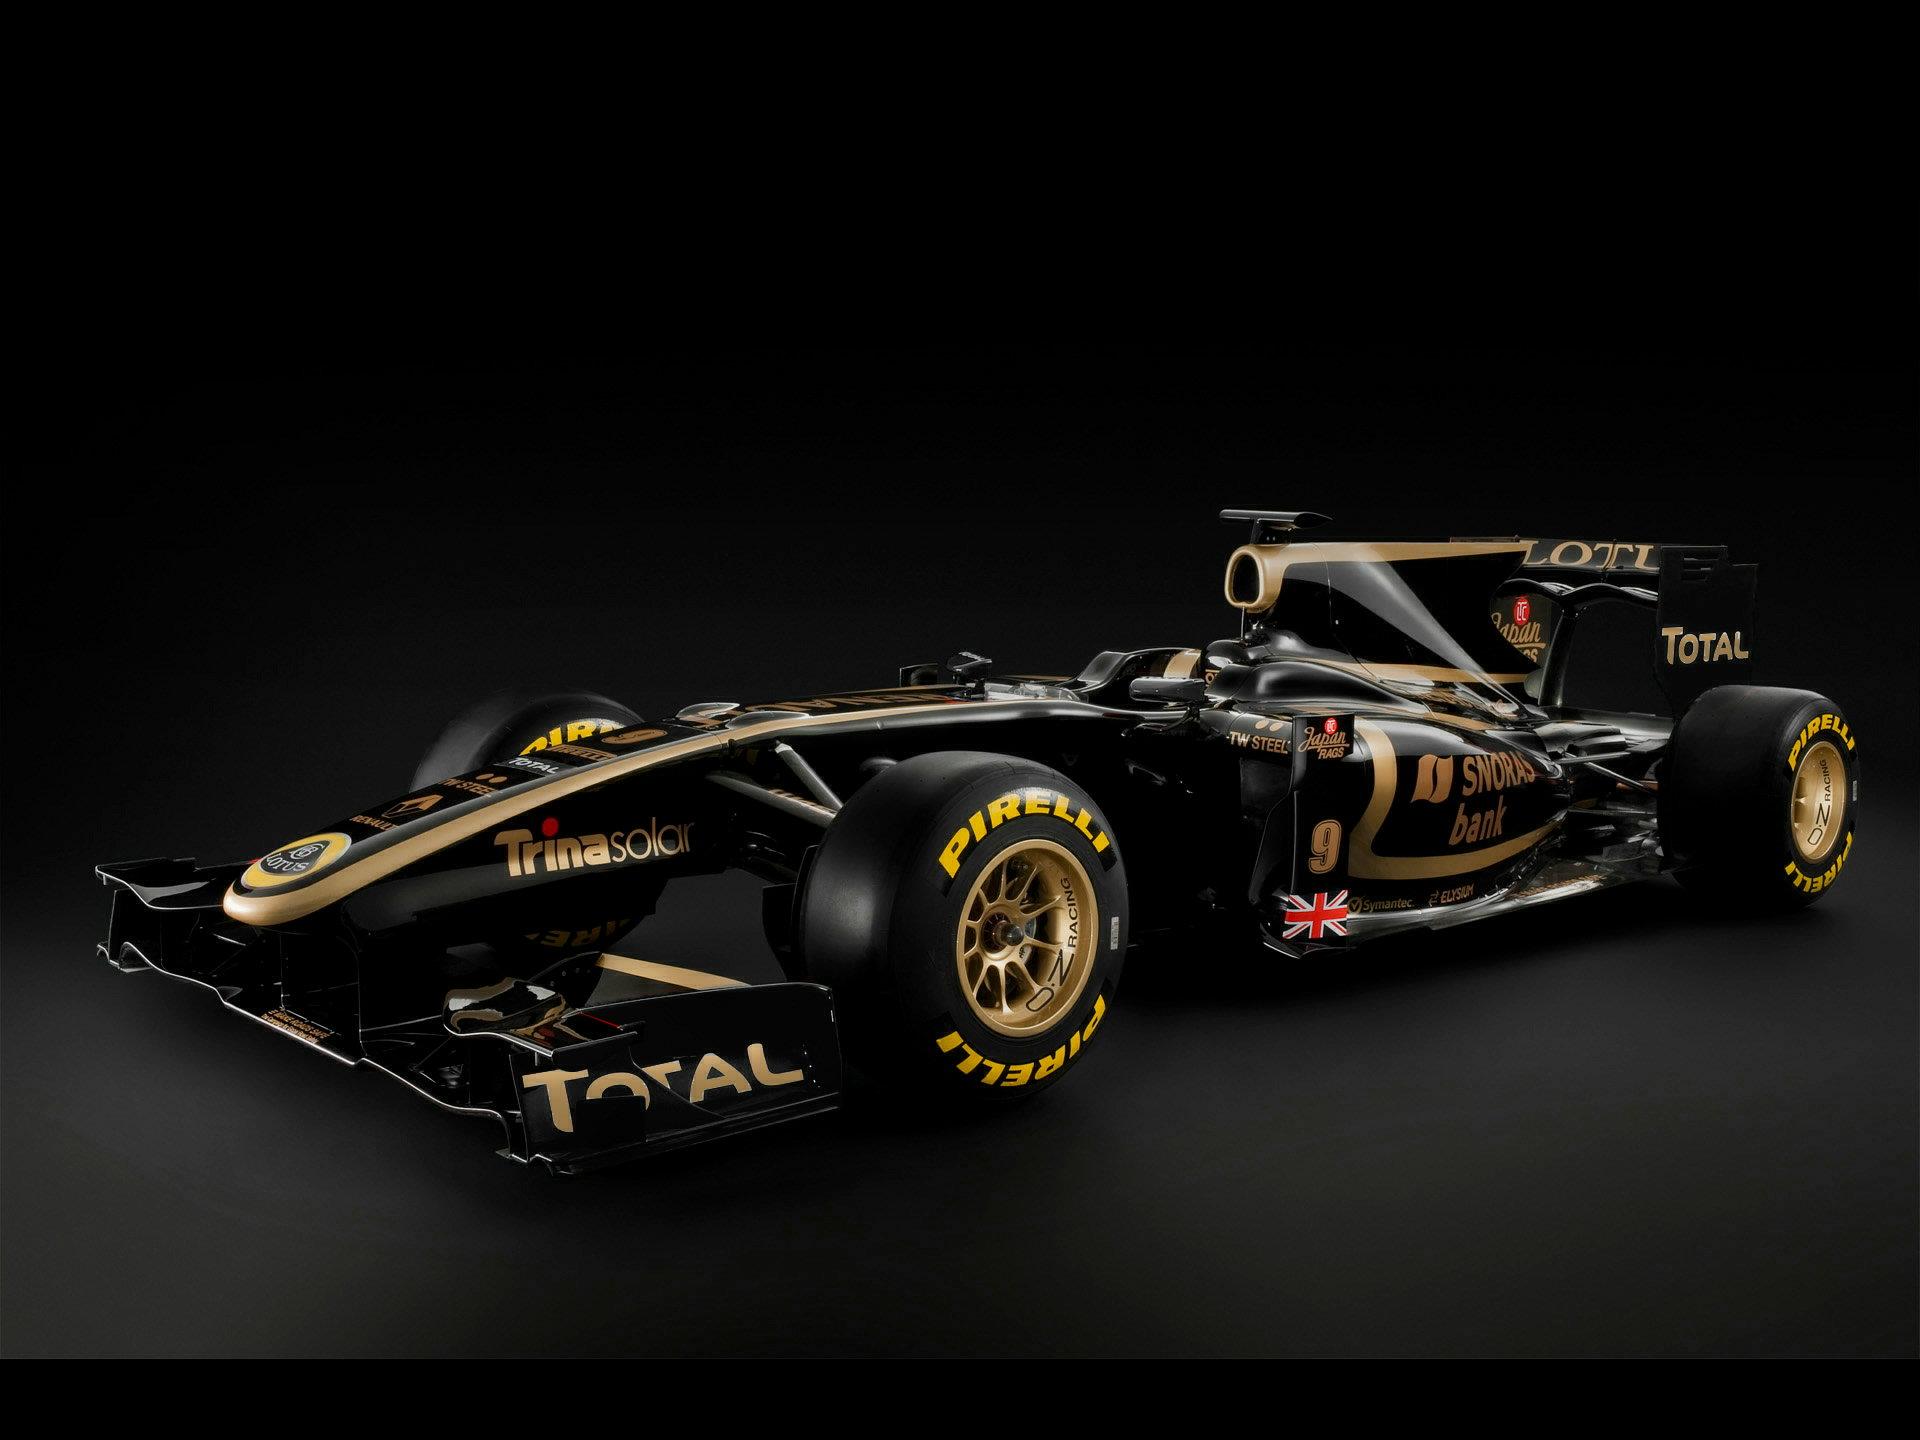 74+ Car Black Background on WallpaperSafari